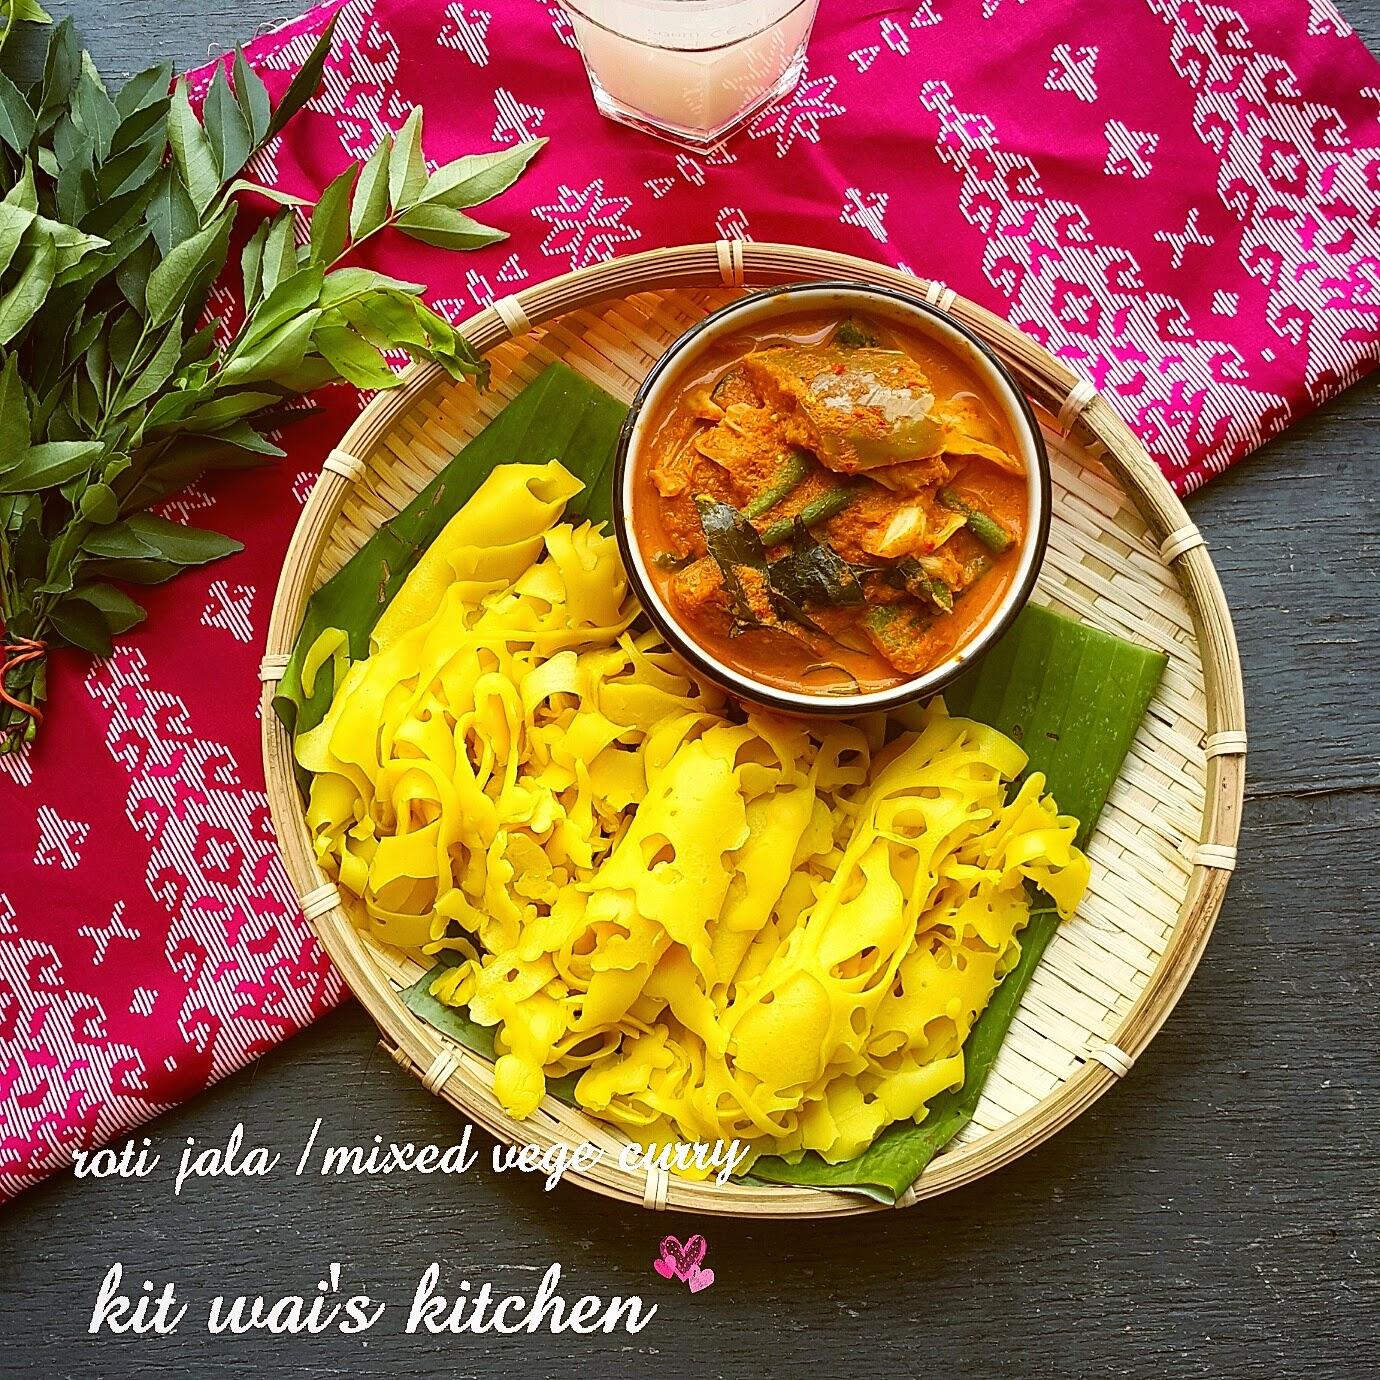 Kit Wai's Kitchen : 煎网糕 + 咖喱杂菜~ Roti Jala + Mixed